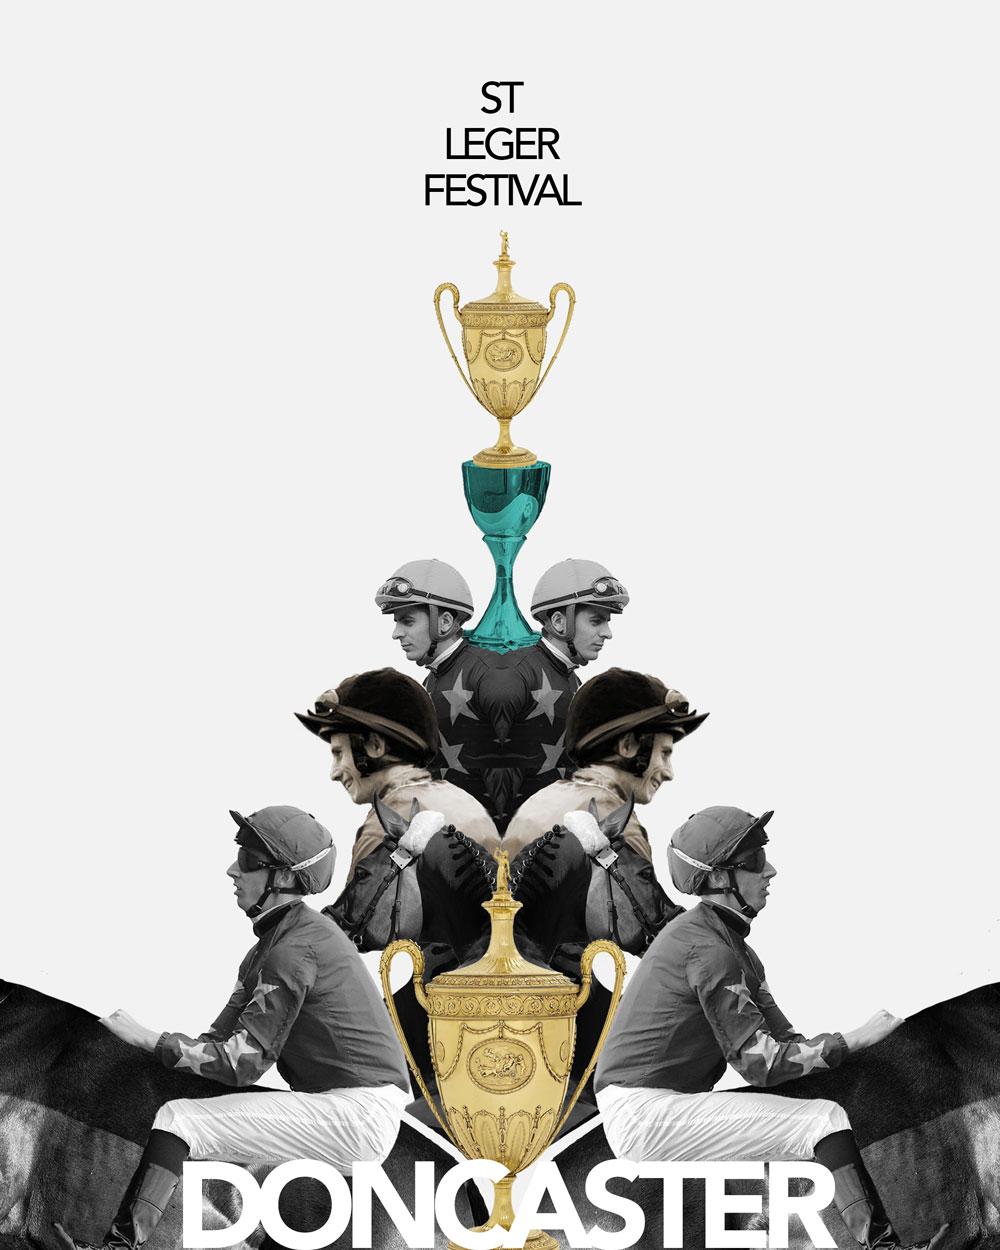 St Leger Festival - Doncaster